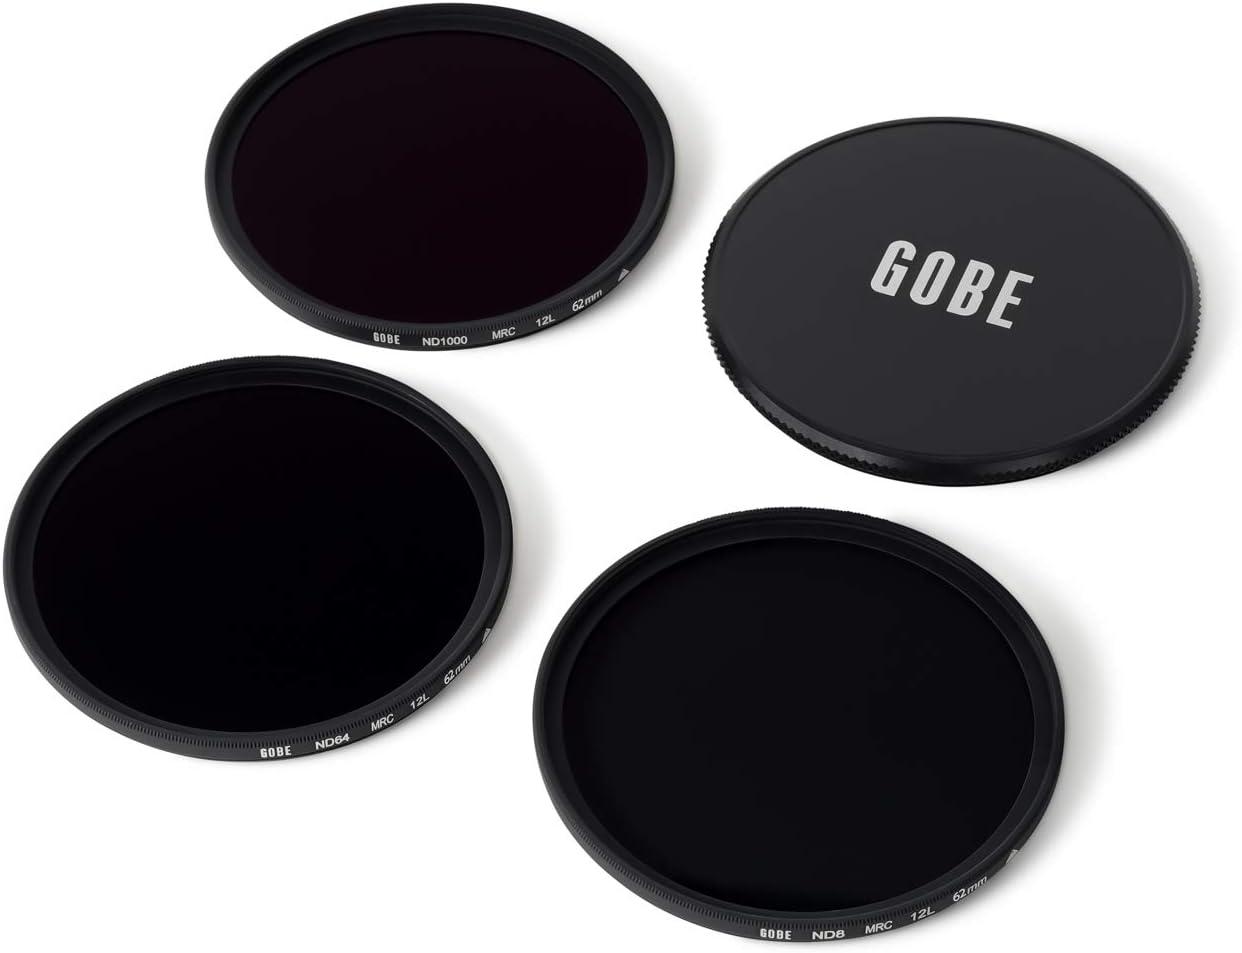 ND64 Gobe 58mm ND8 1Peak ND1000 Lens Filter Kit